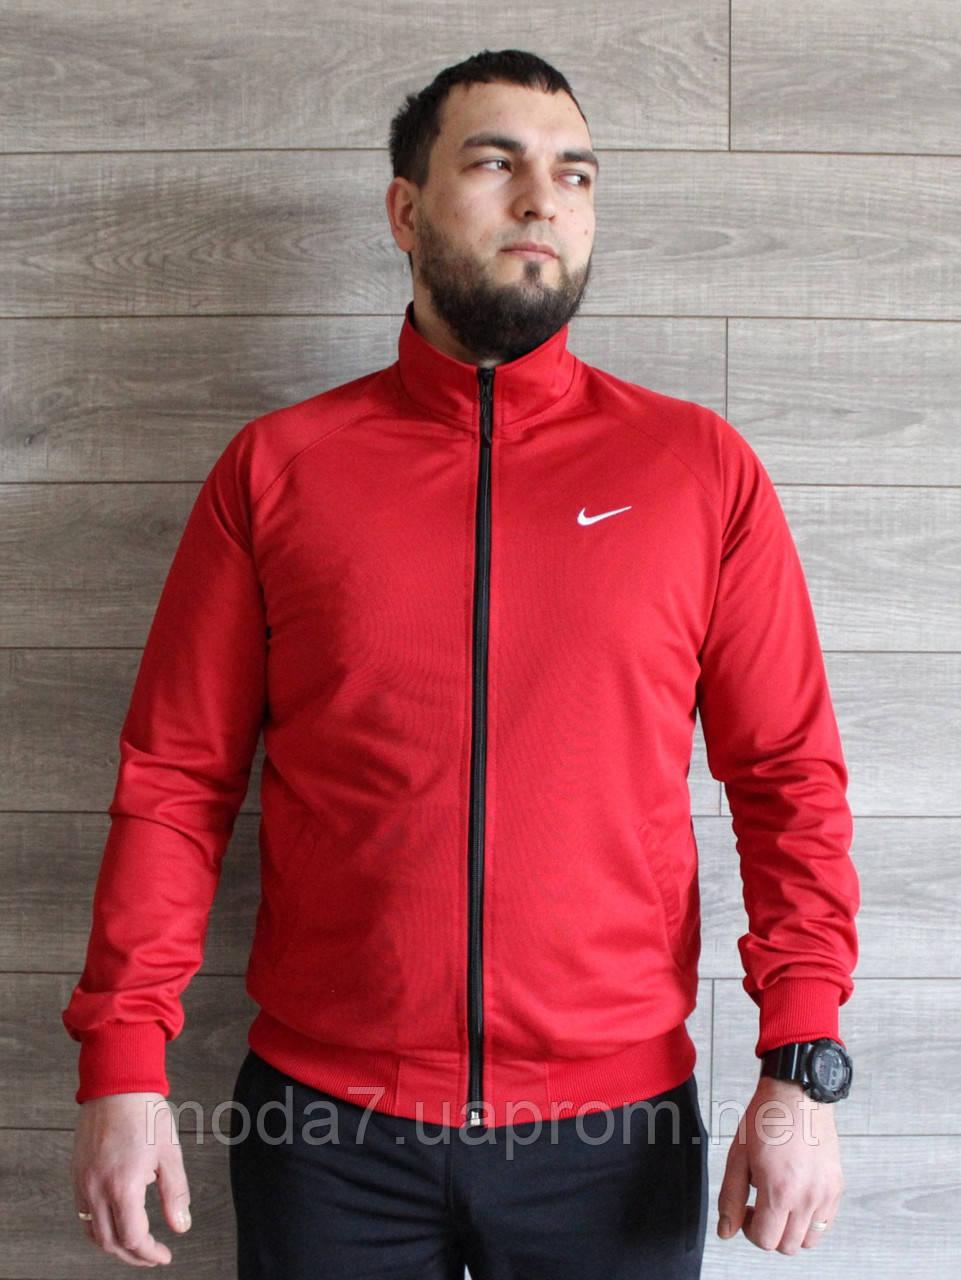 Кофта спортивная мужская Nike красная реплика